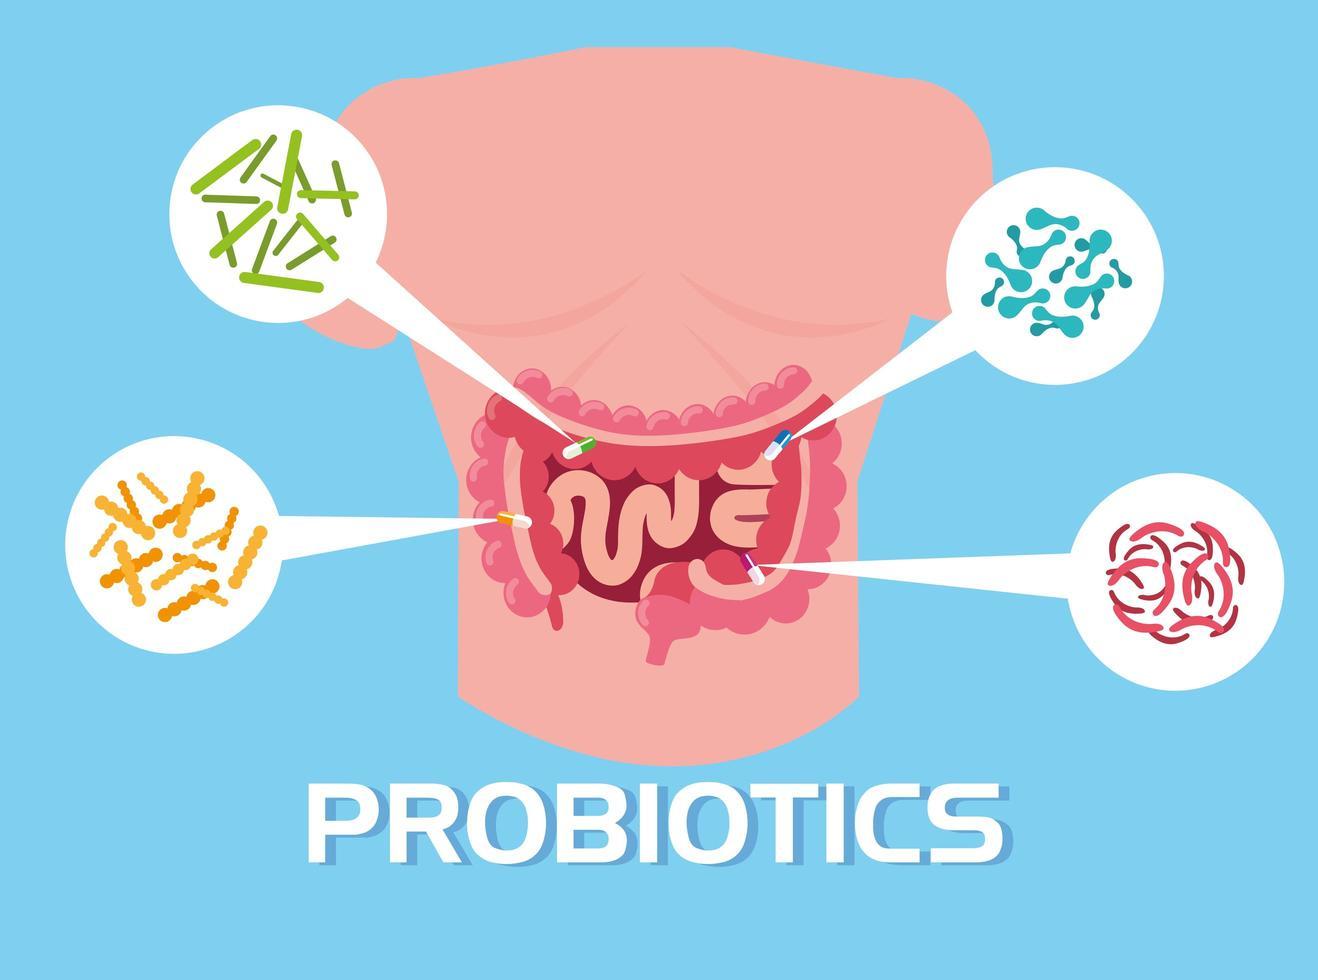 Body part with probiotics organisms vector